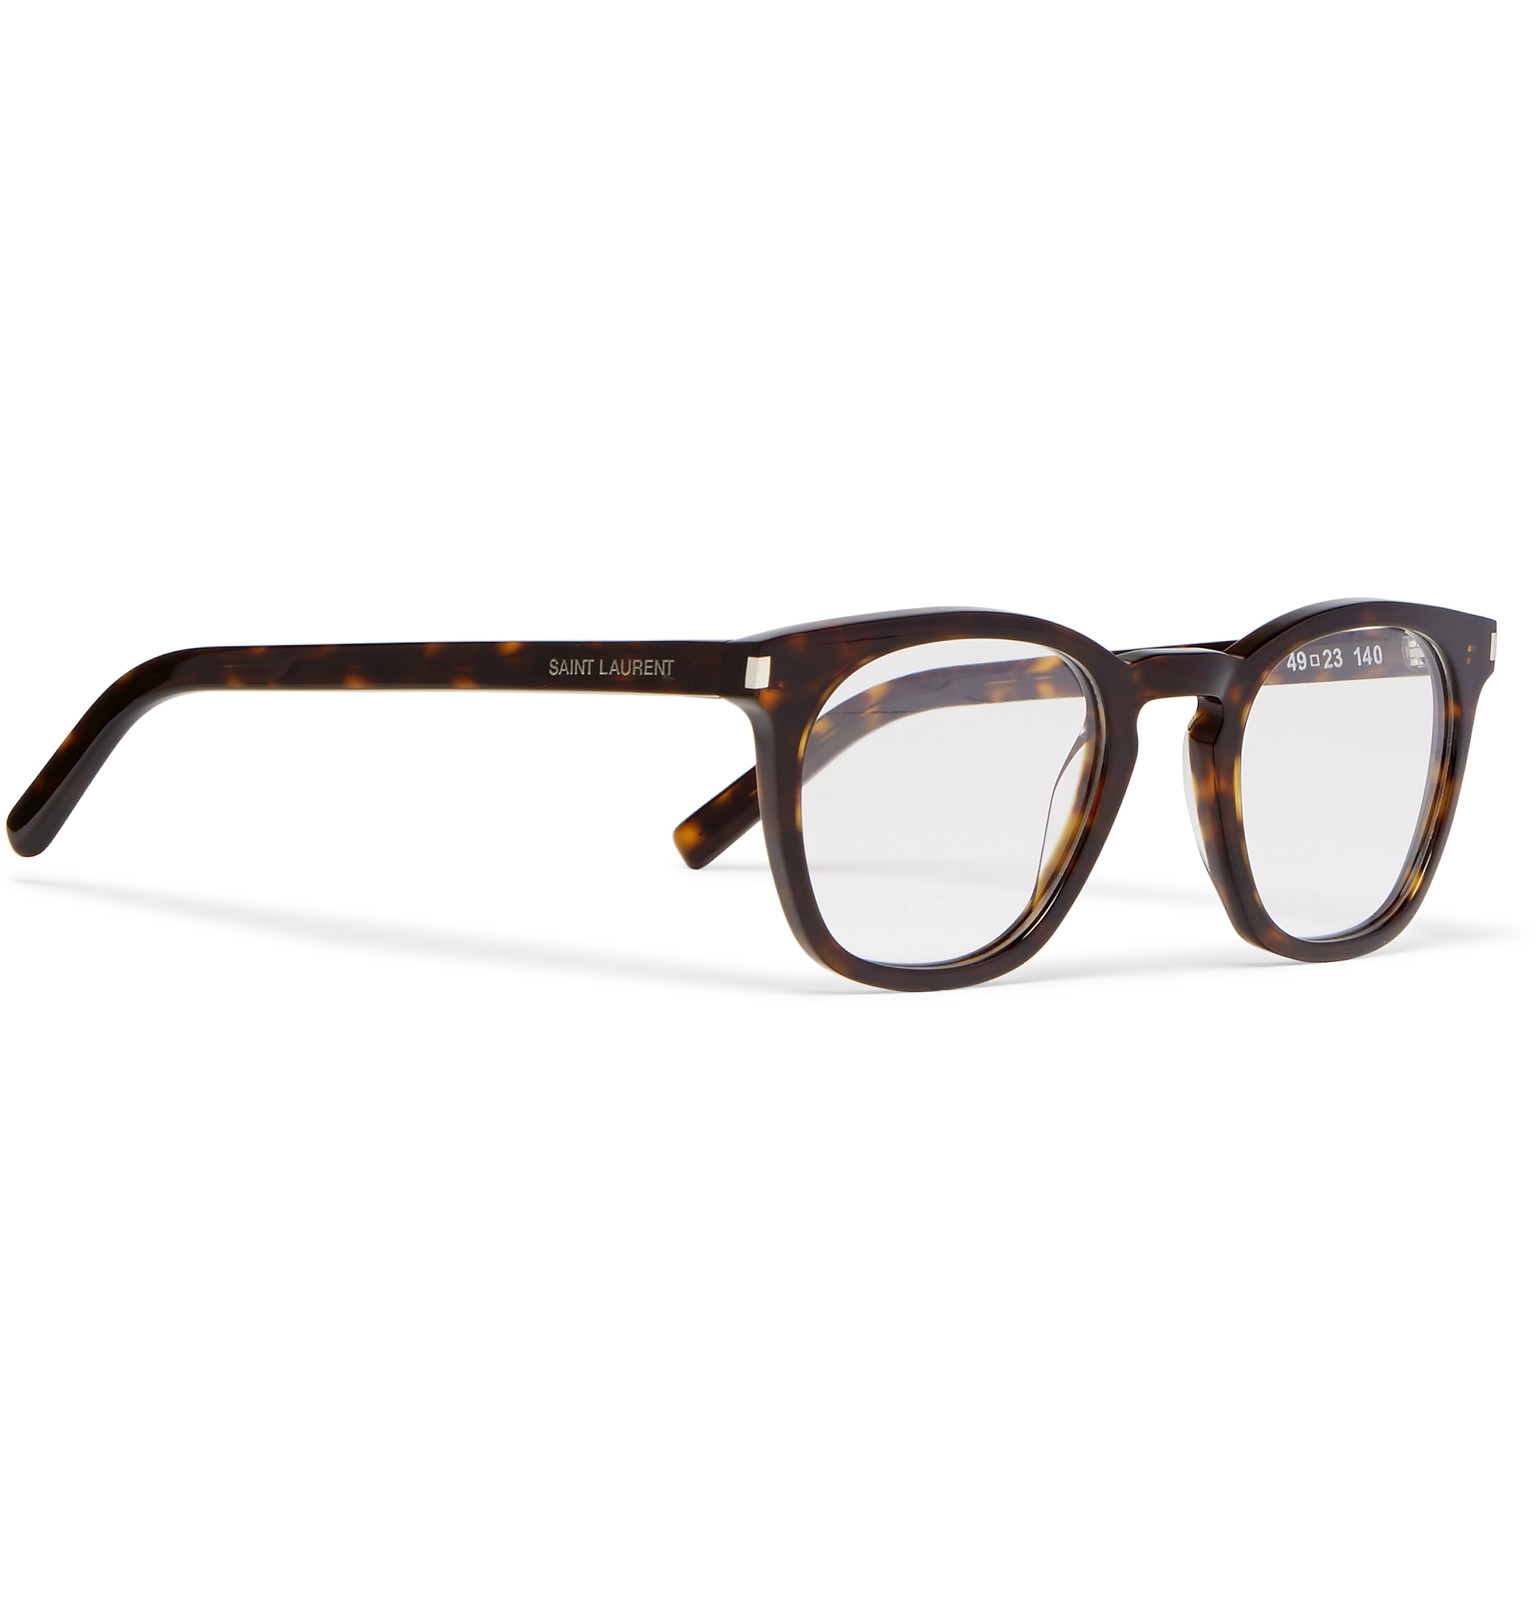 a58205d5370 Saint Laurent Havana Square-frame Tortoiseshell Acetate Optical ...